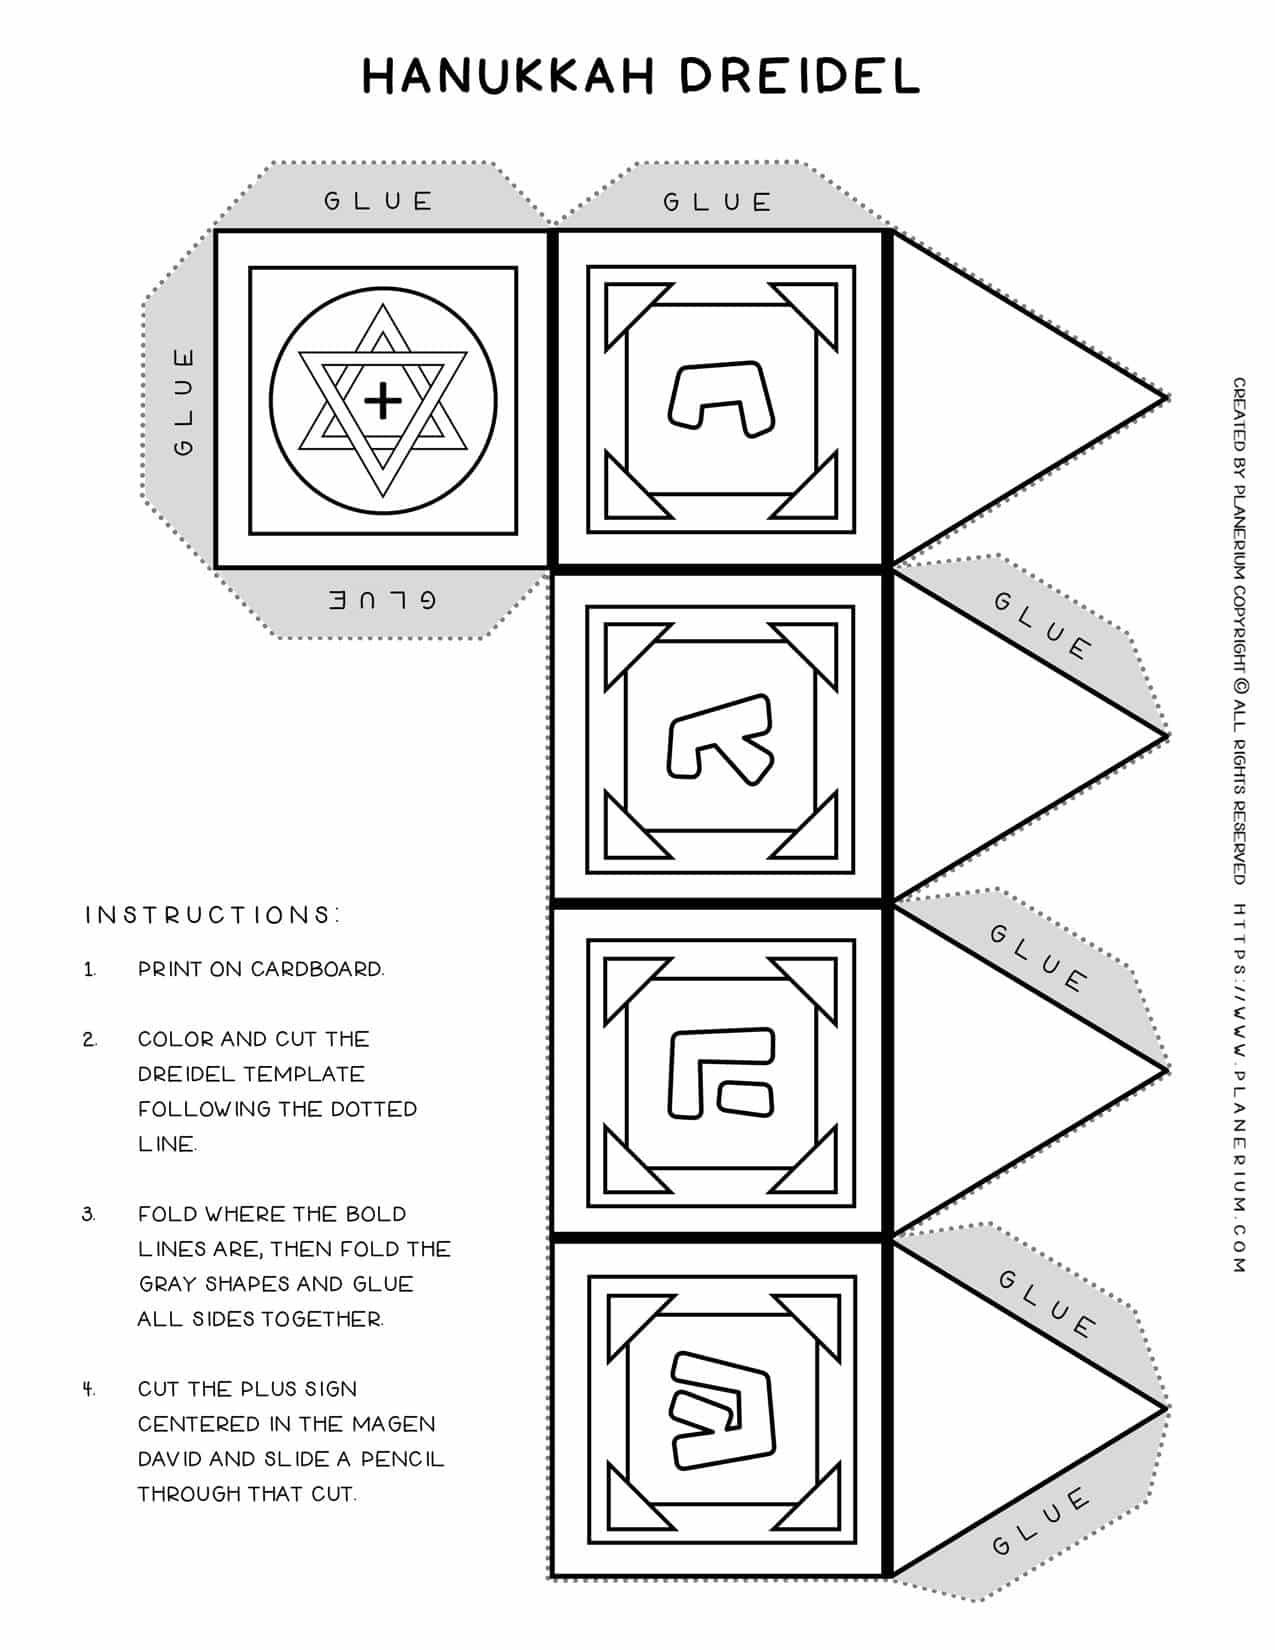 Dreidel Template - How to make a dreidel with the letter Shin - Hanukkah Worksheet   Planerium